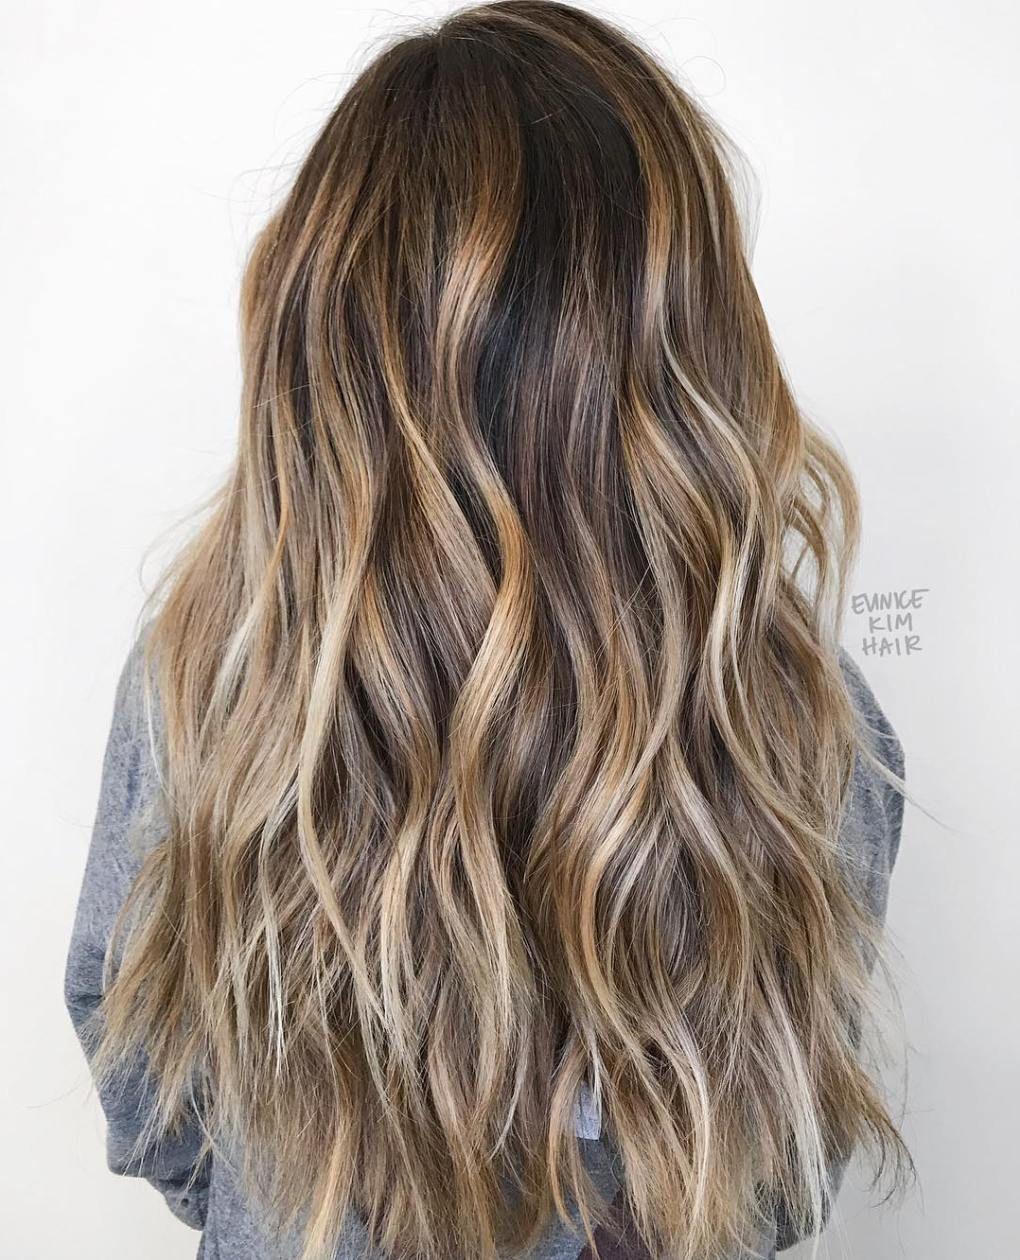 dirty blonde hair ideas that work on everyone hair pinterest